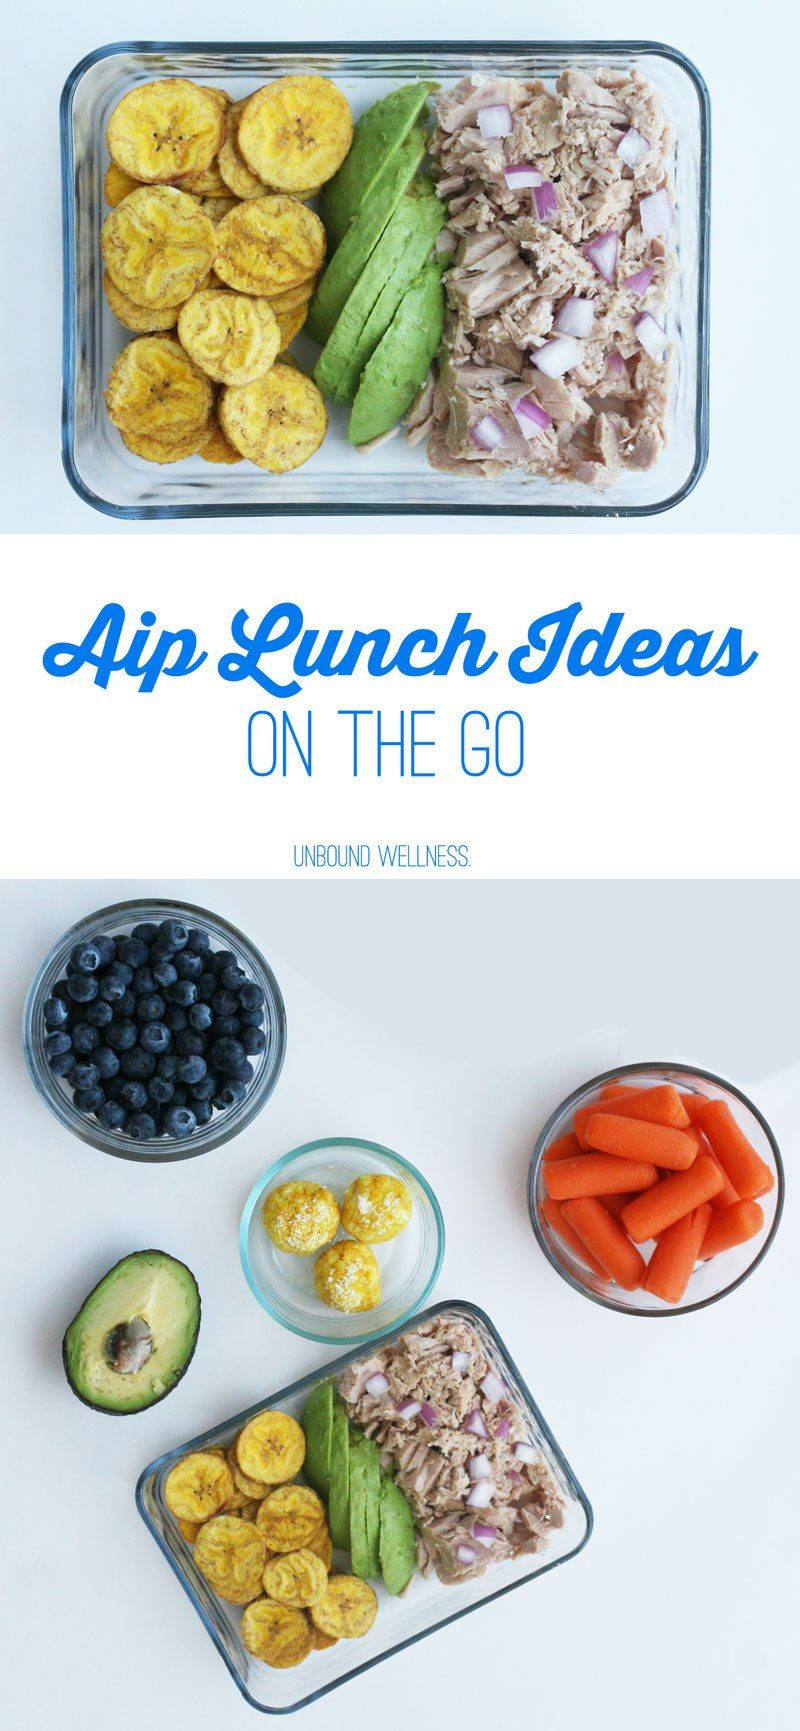 pinterest recipes for autoimmune diet